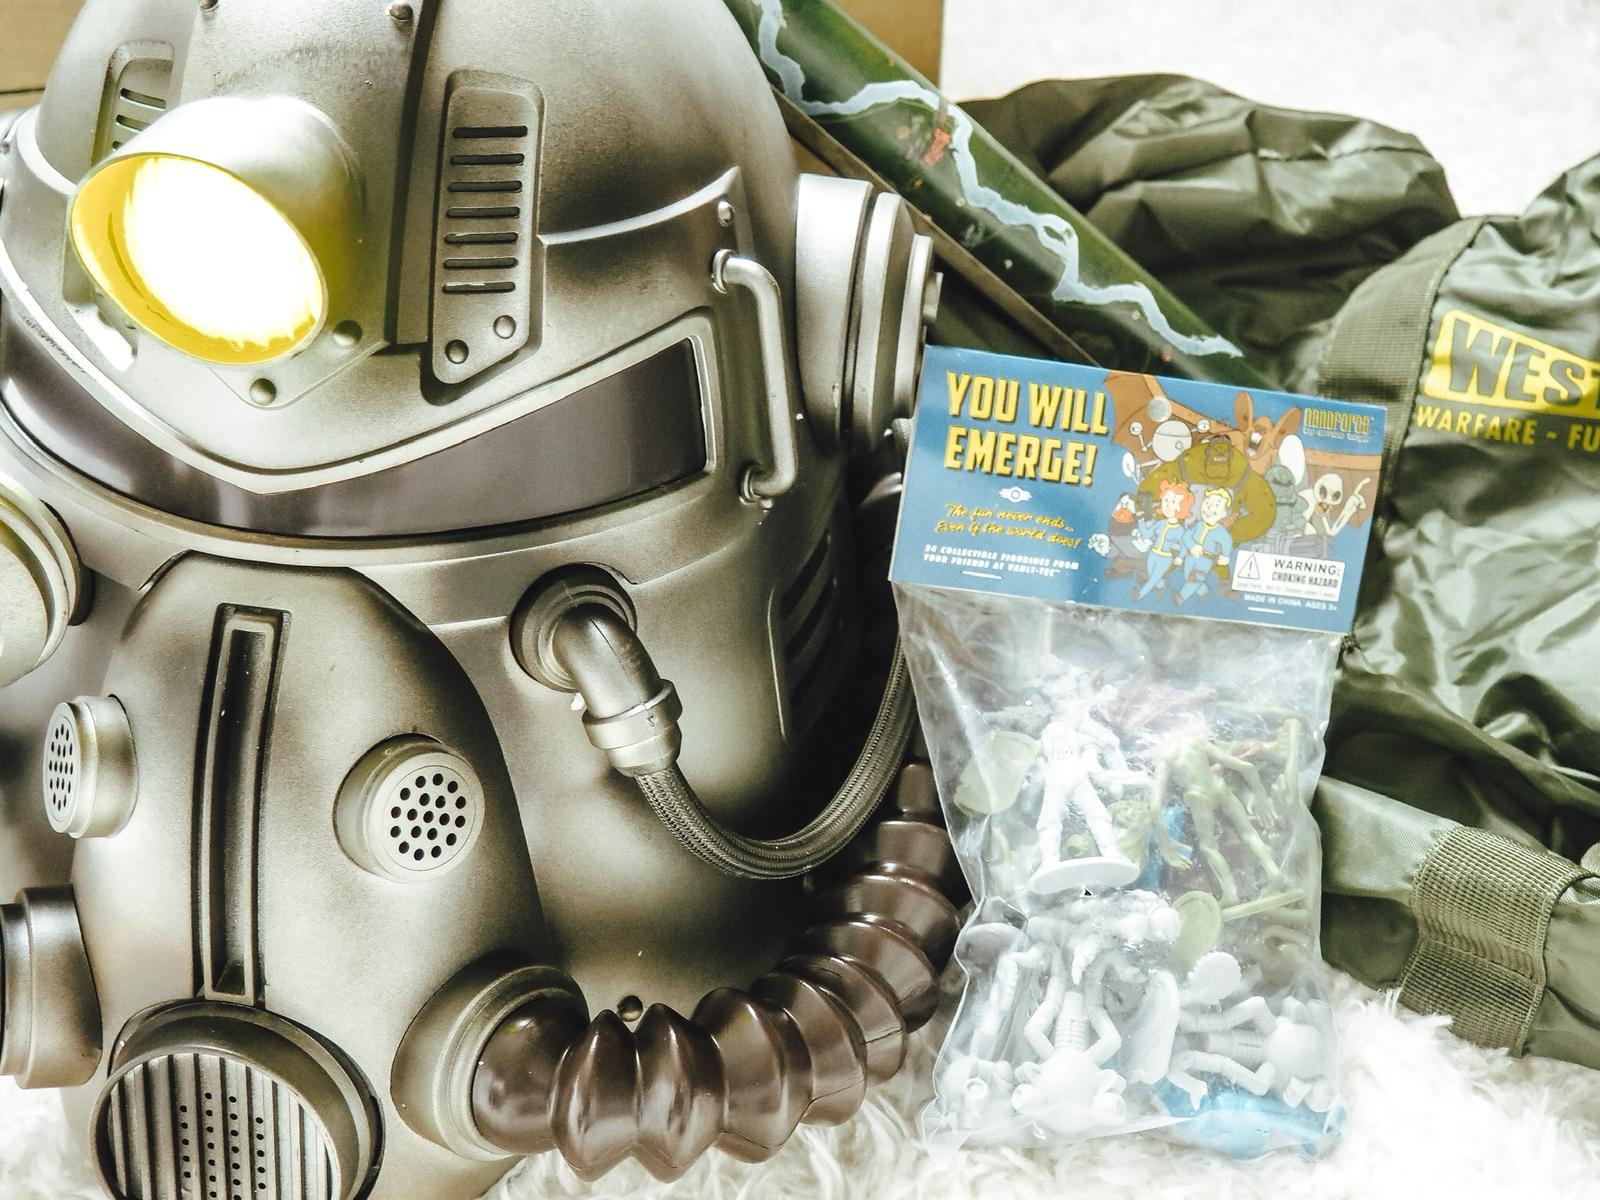 Der Inhalt der Fallout 76 Power Armor Edition erfreut jeden Endzetgames-Fan!